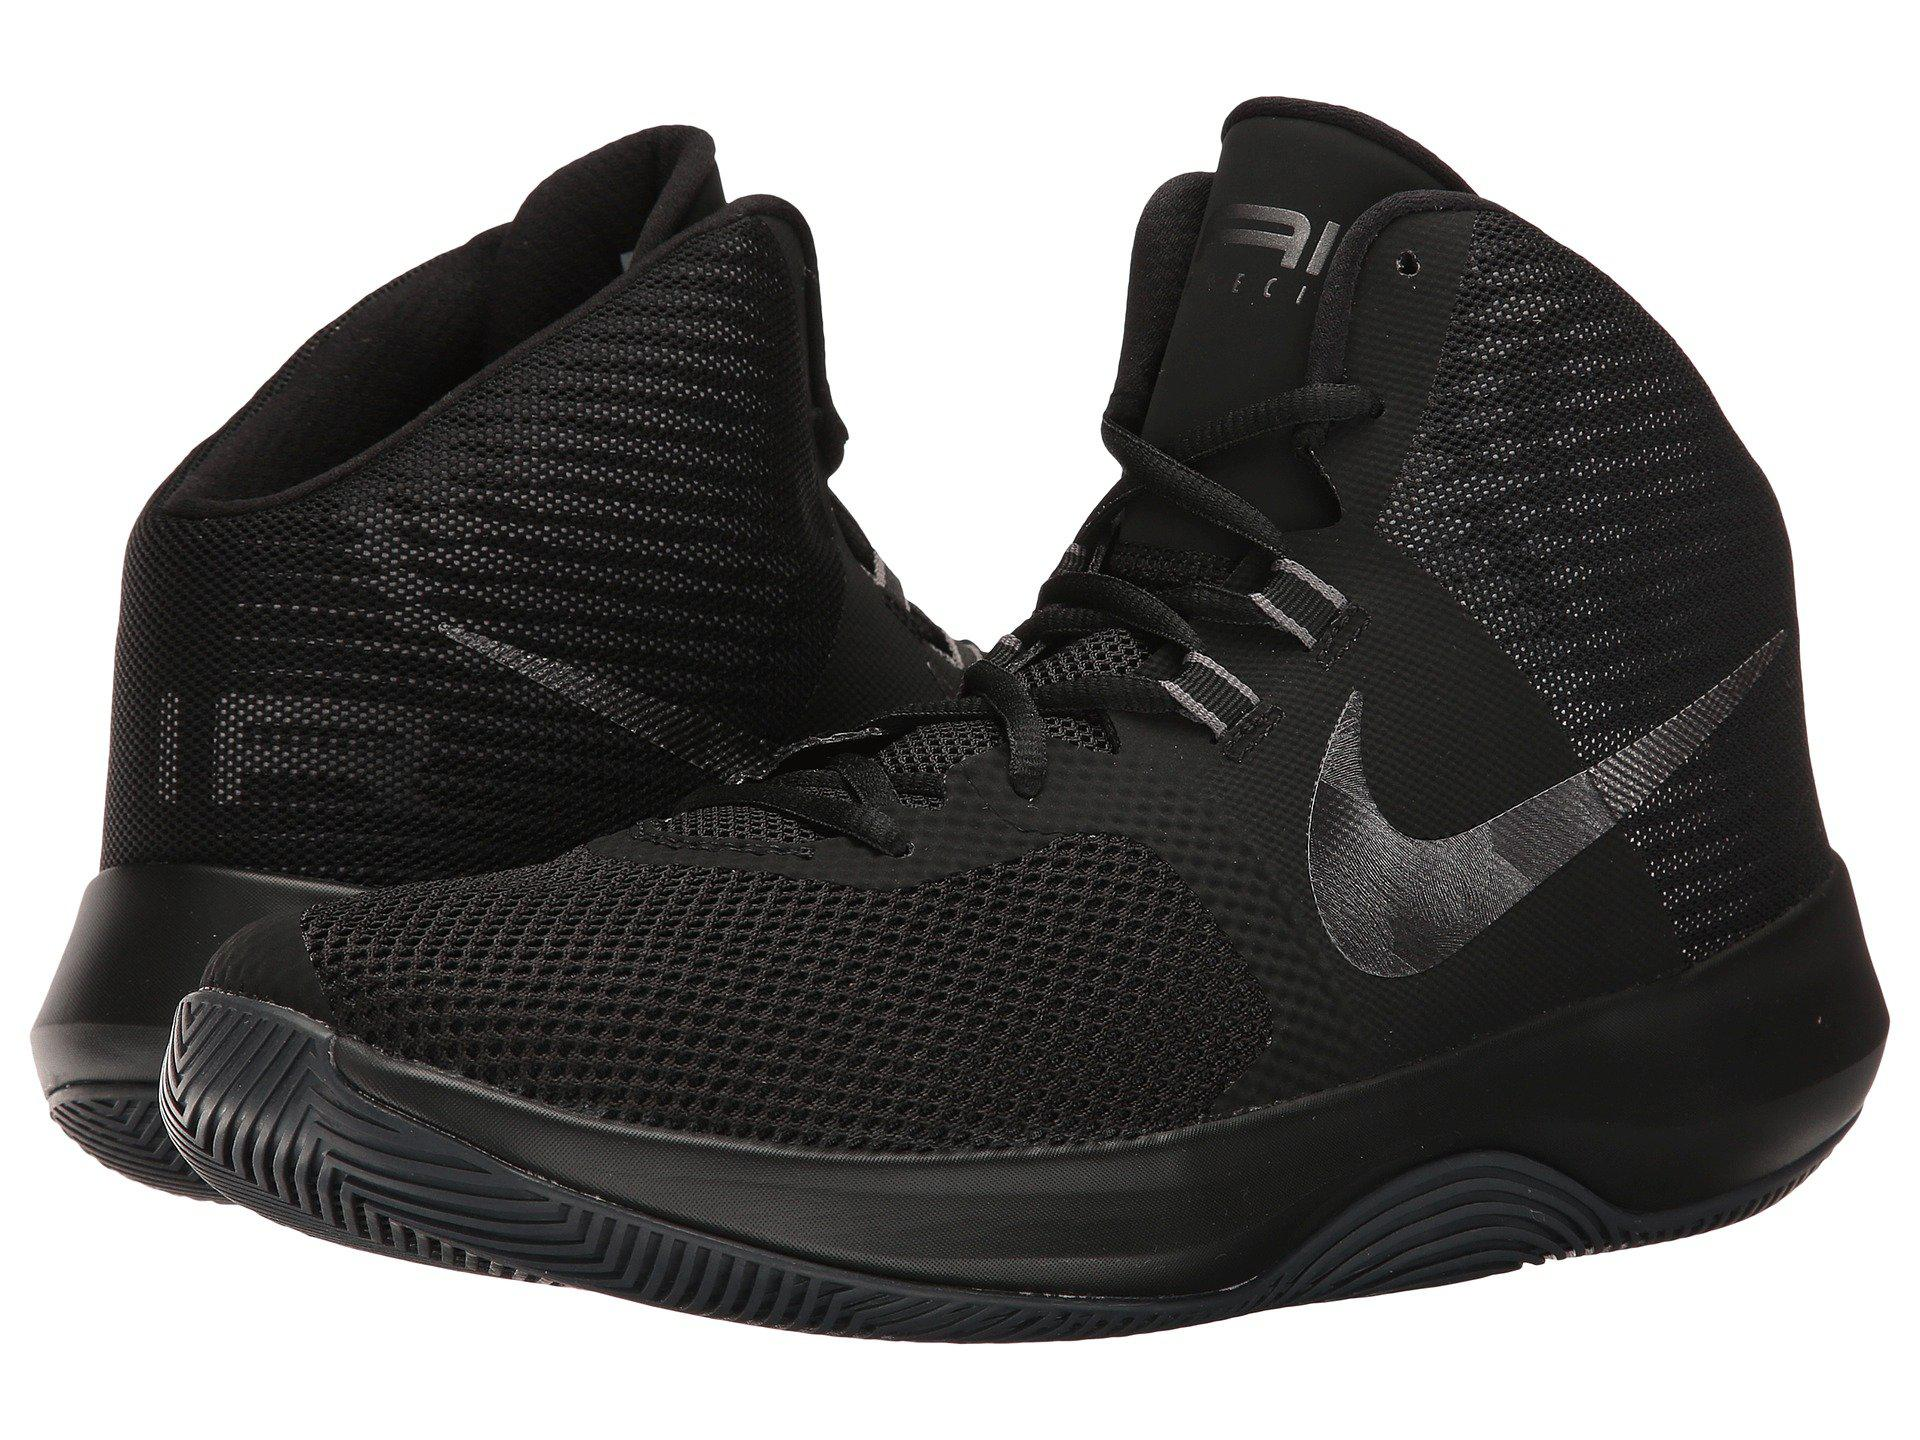 036bcbb20ae Lyst - Nike Air Precision Nbk in Black for Men